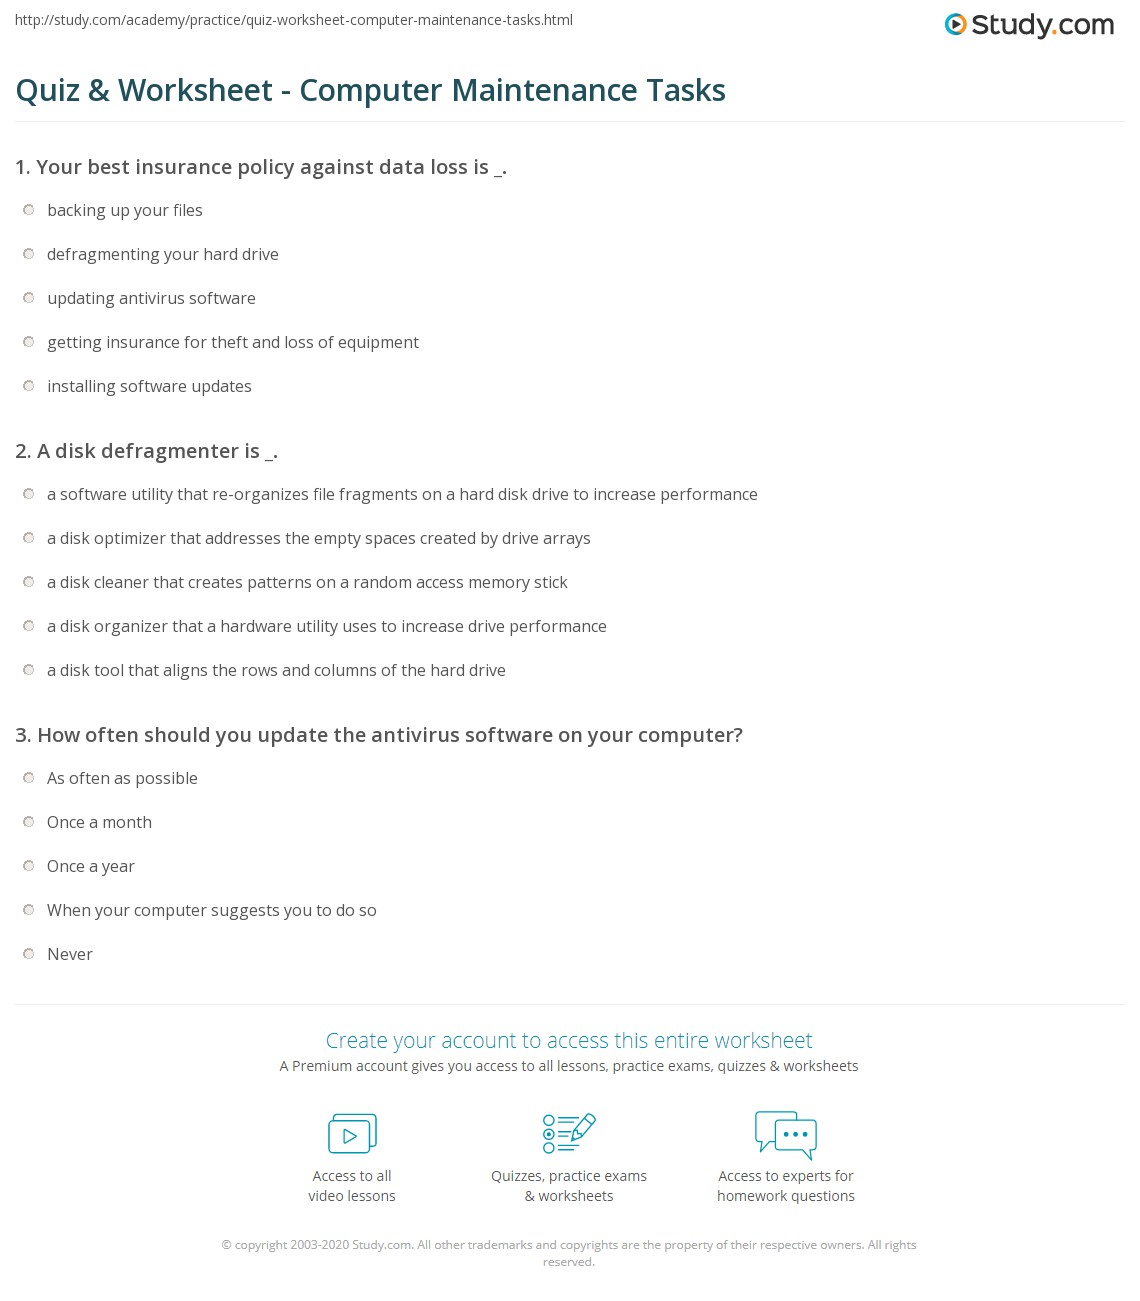 Quiz & Worksheet - Computer Maintenance Tasks | Study com